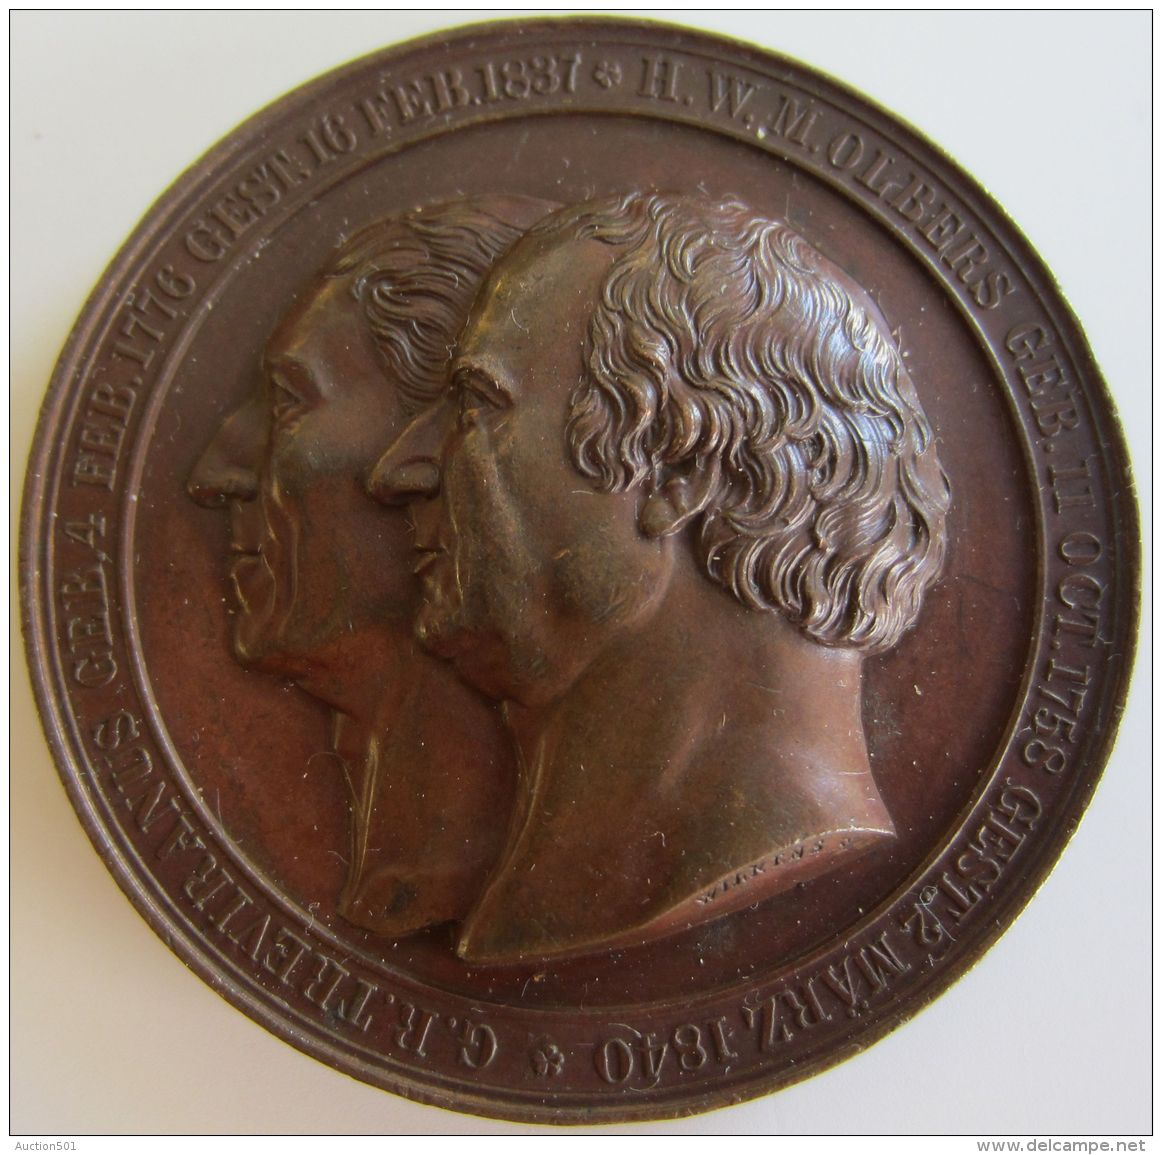 M01920  TREVIRANUS - OLBERS - PINGOUIN - DEUTSCHEN NATURFORSCHERN AERZTEN MUSEUM  BREMIEN 1844 -  Leurs Profils (66g) - Allemagne